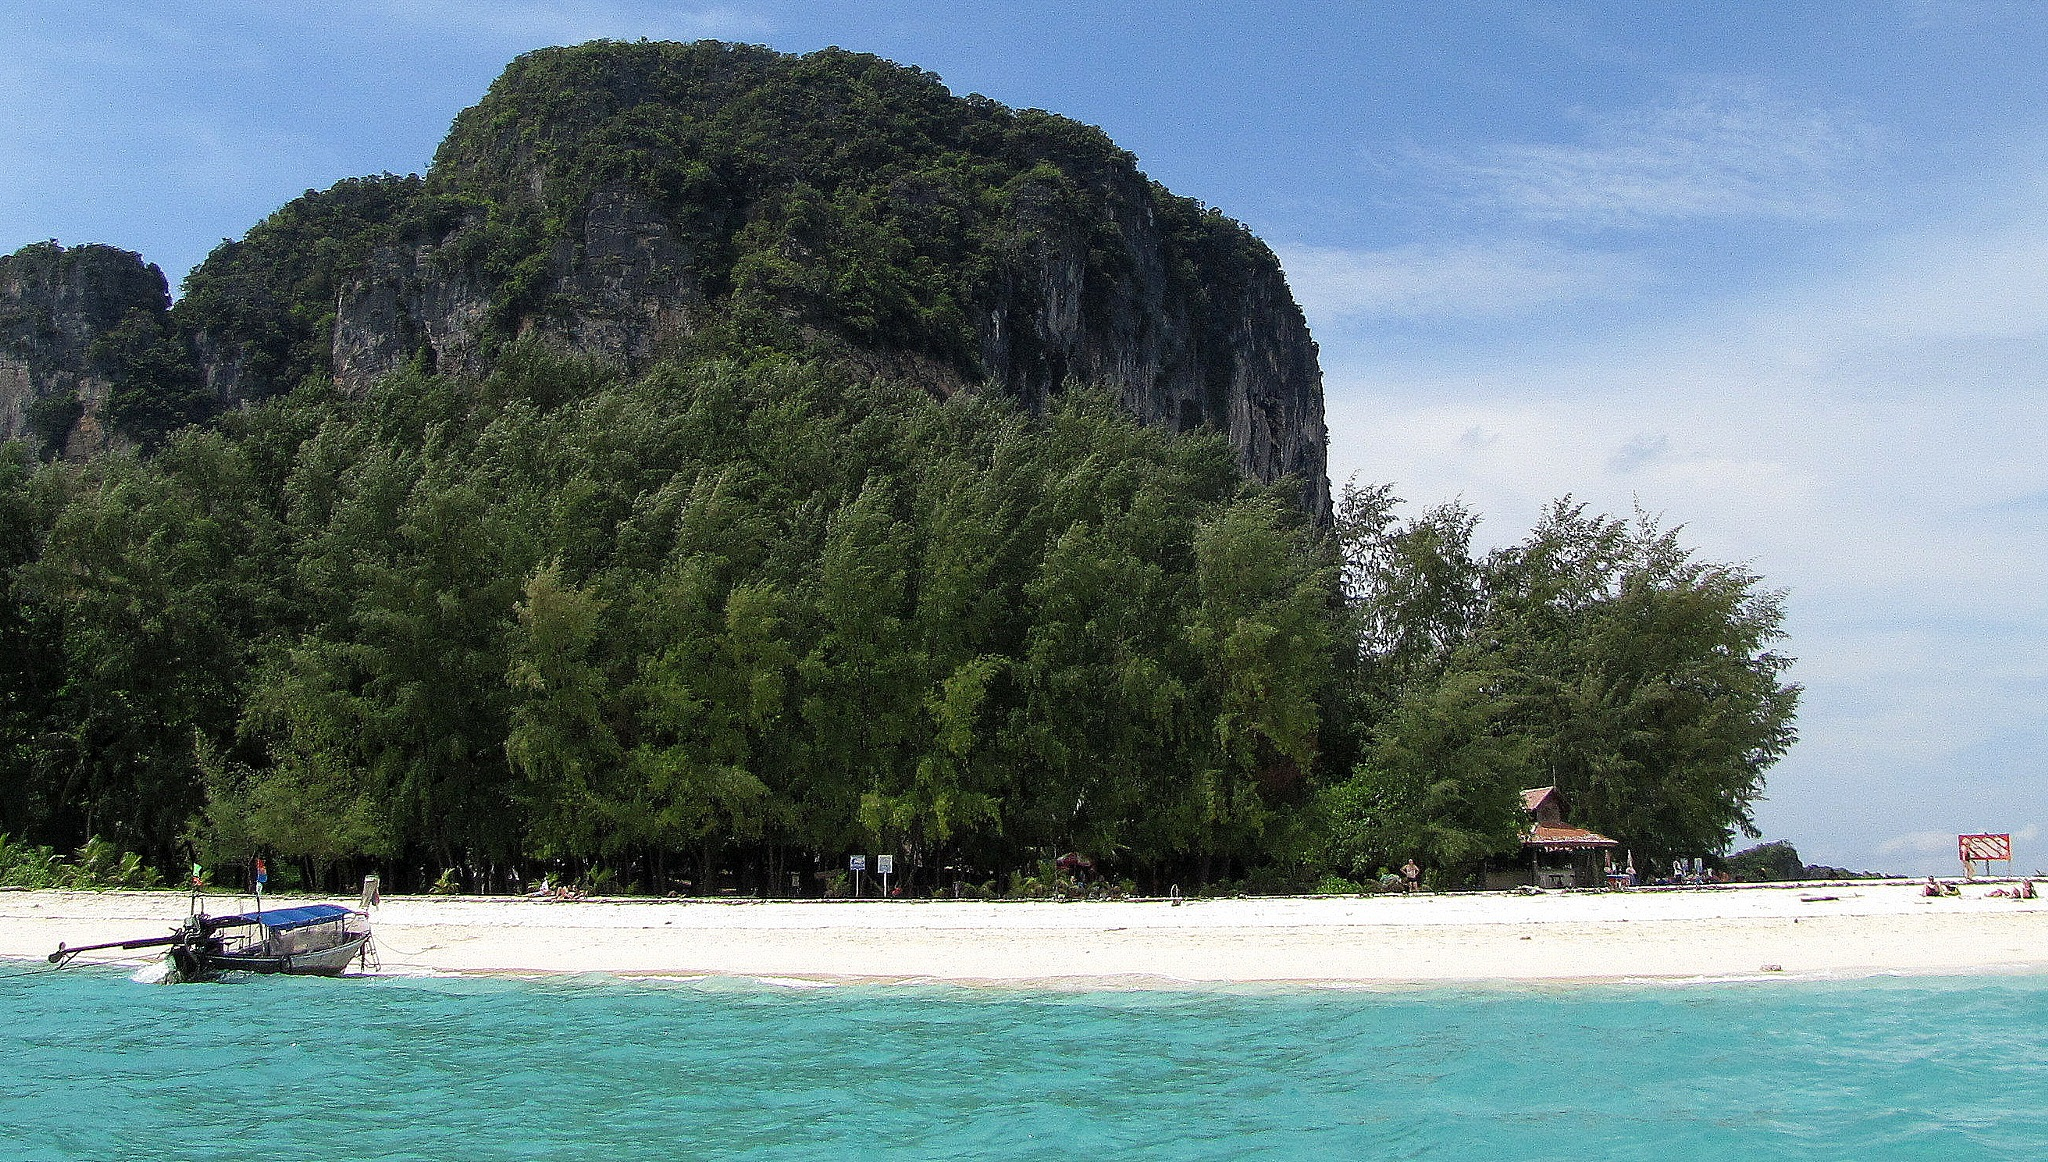 Tup Island, Krabi, Thailand by saharajib